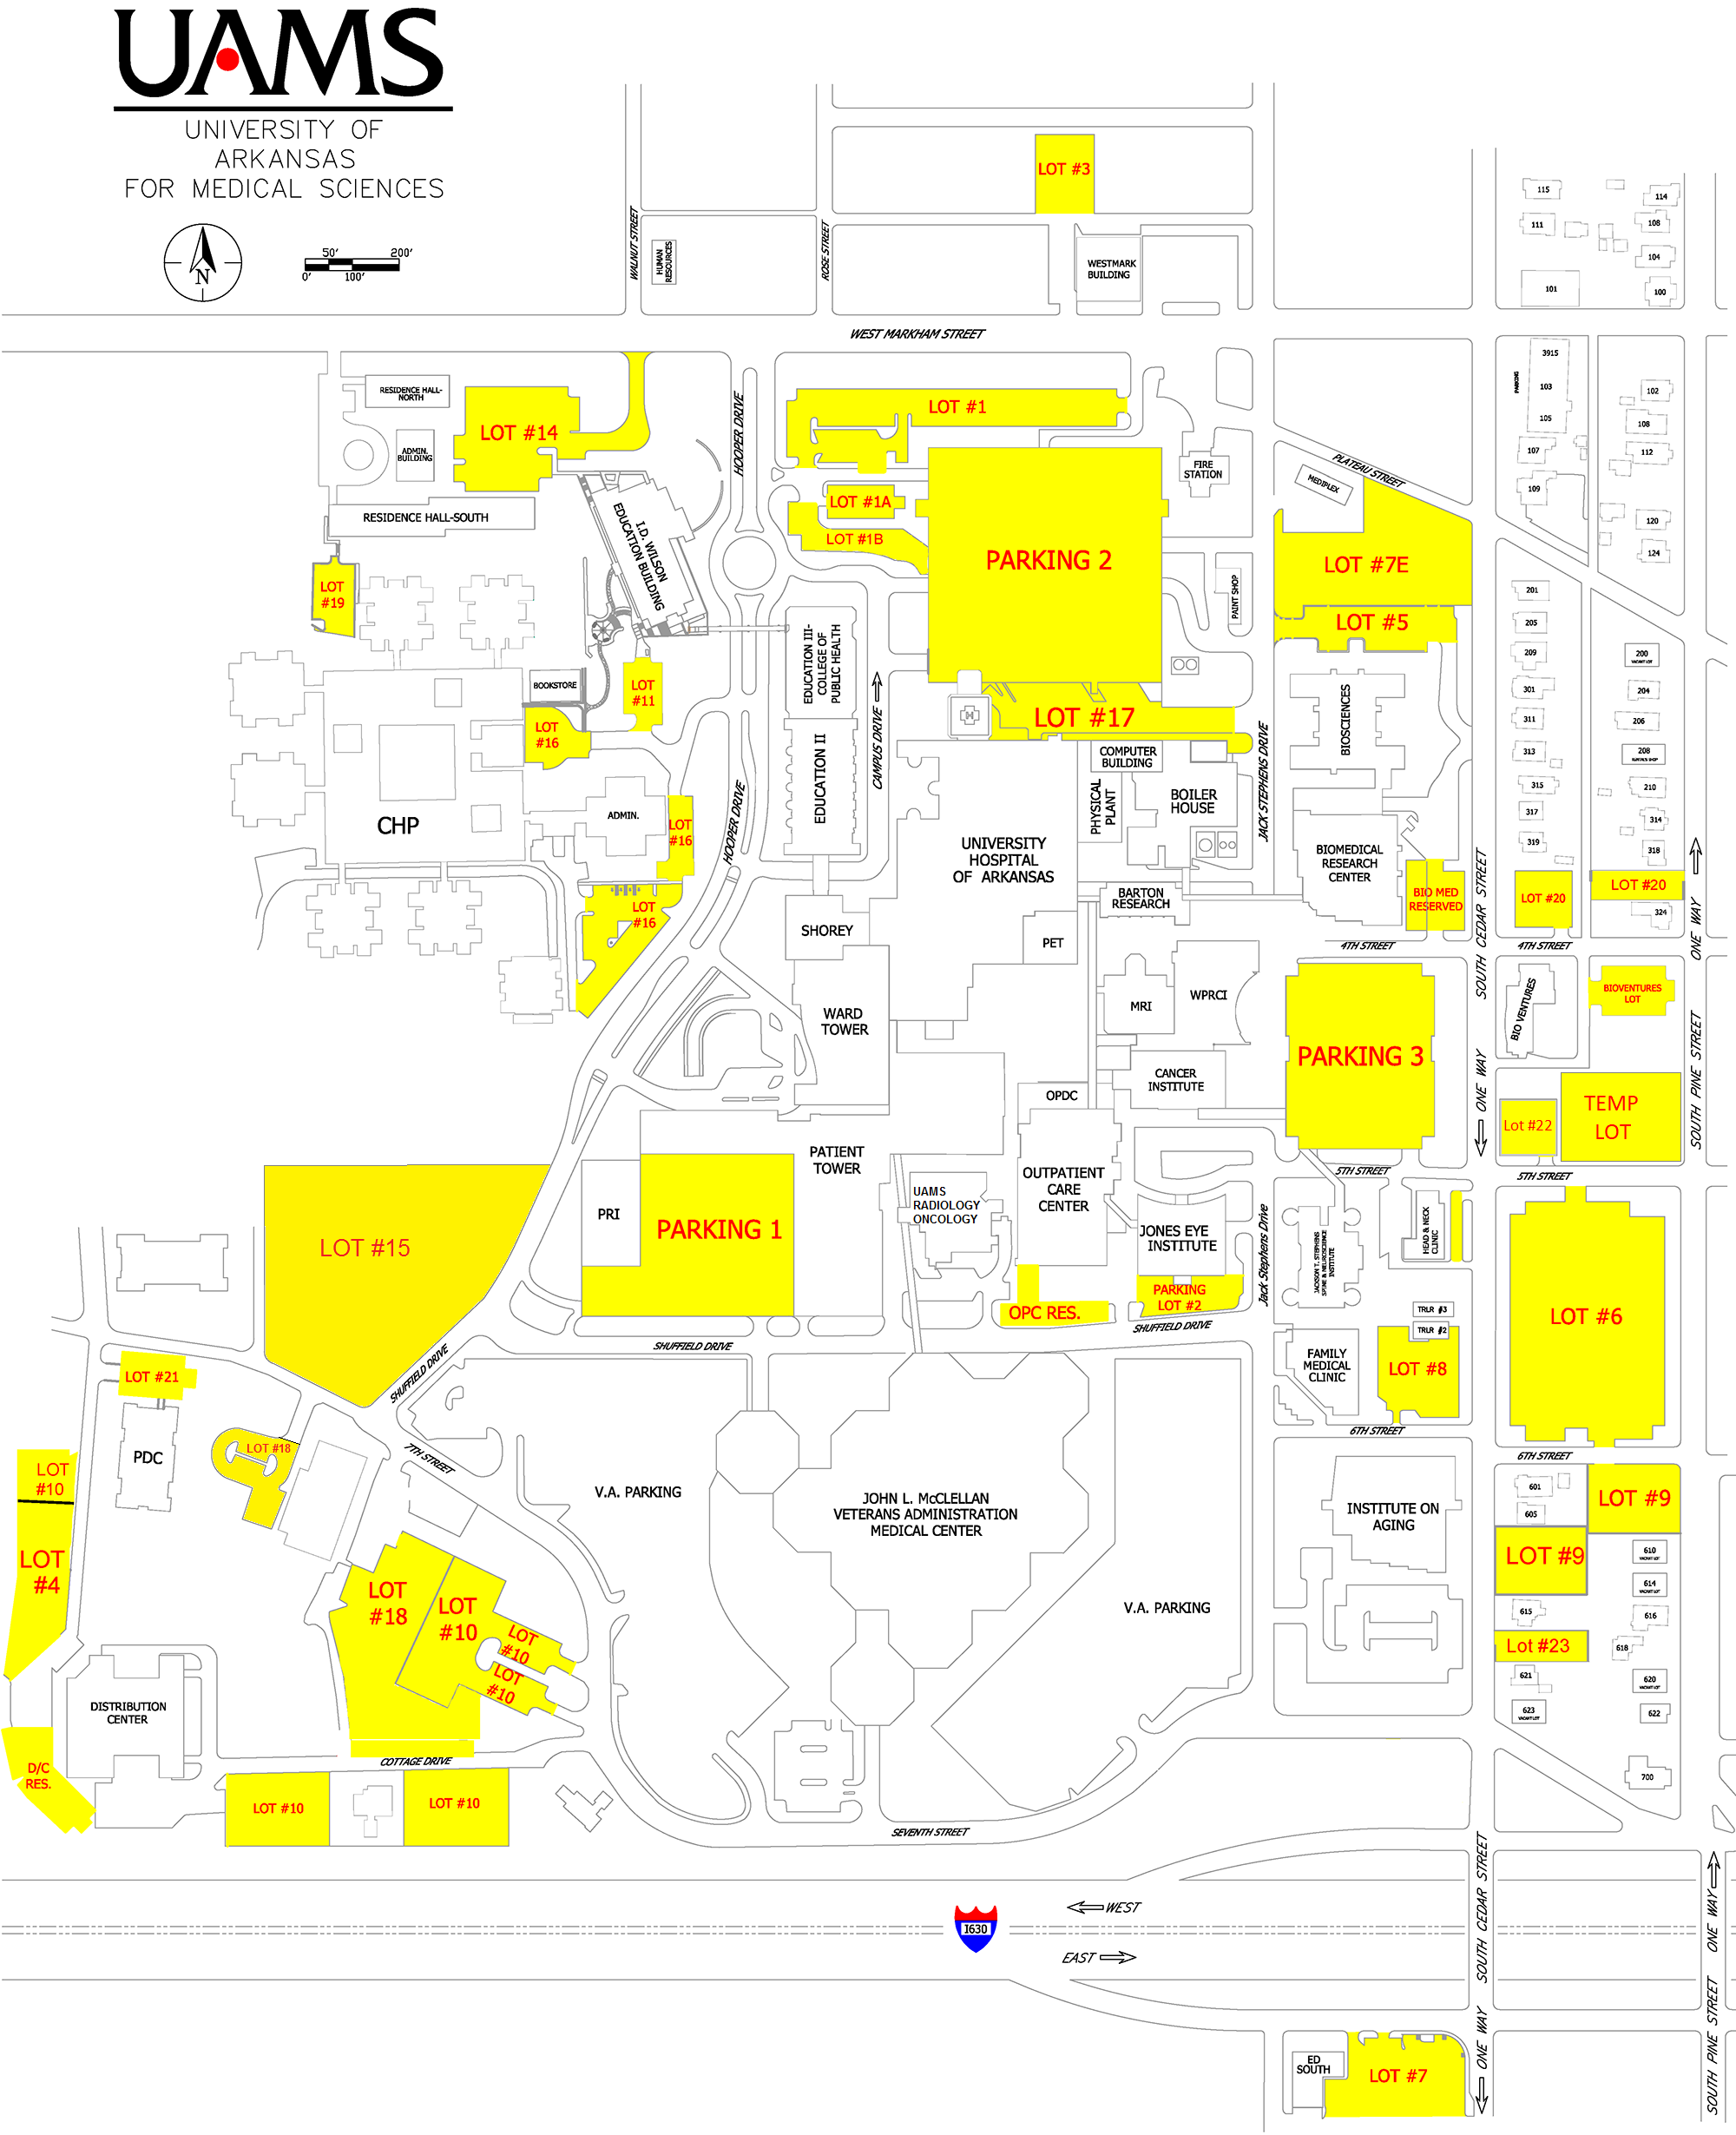 Parking General Information